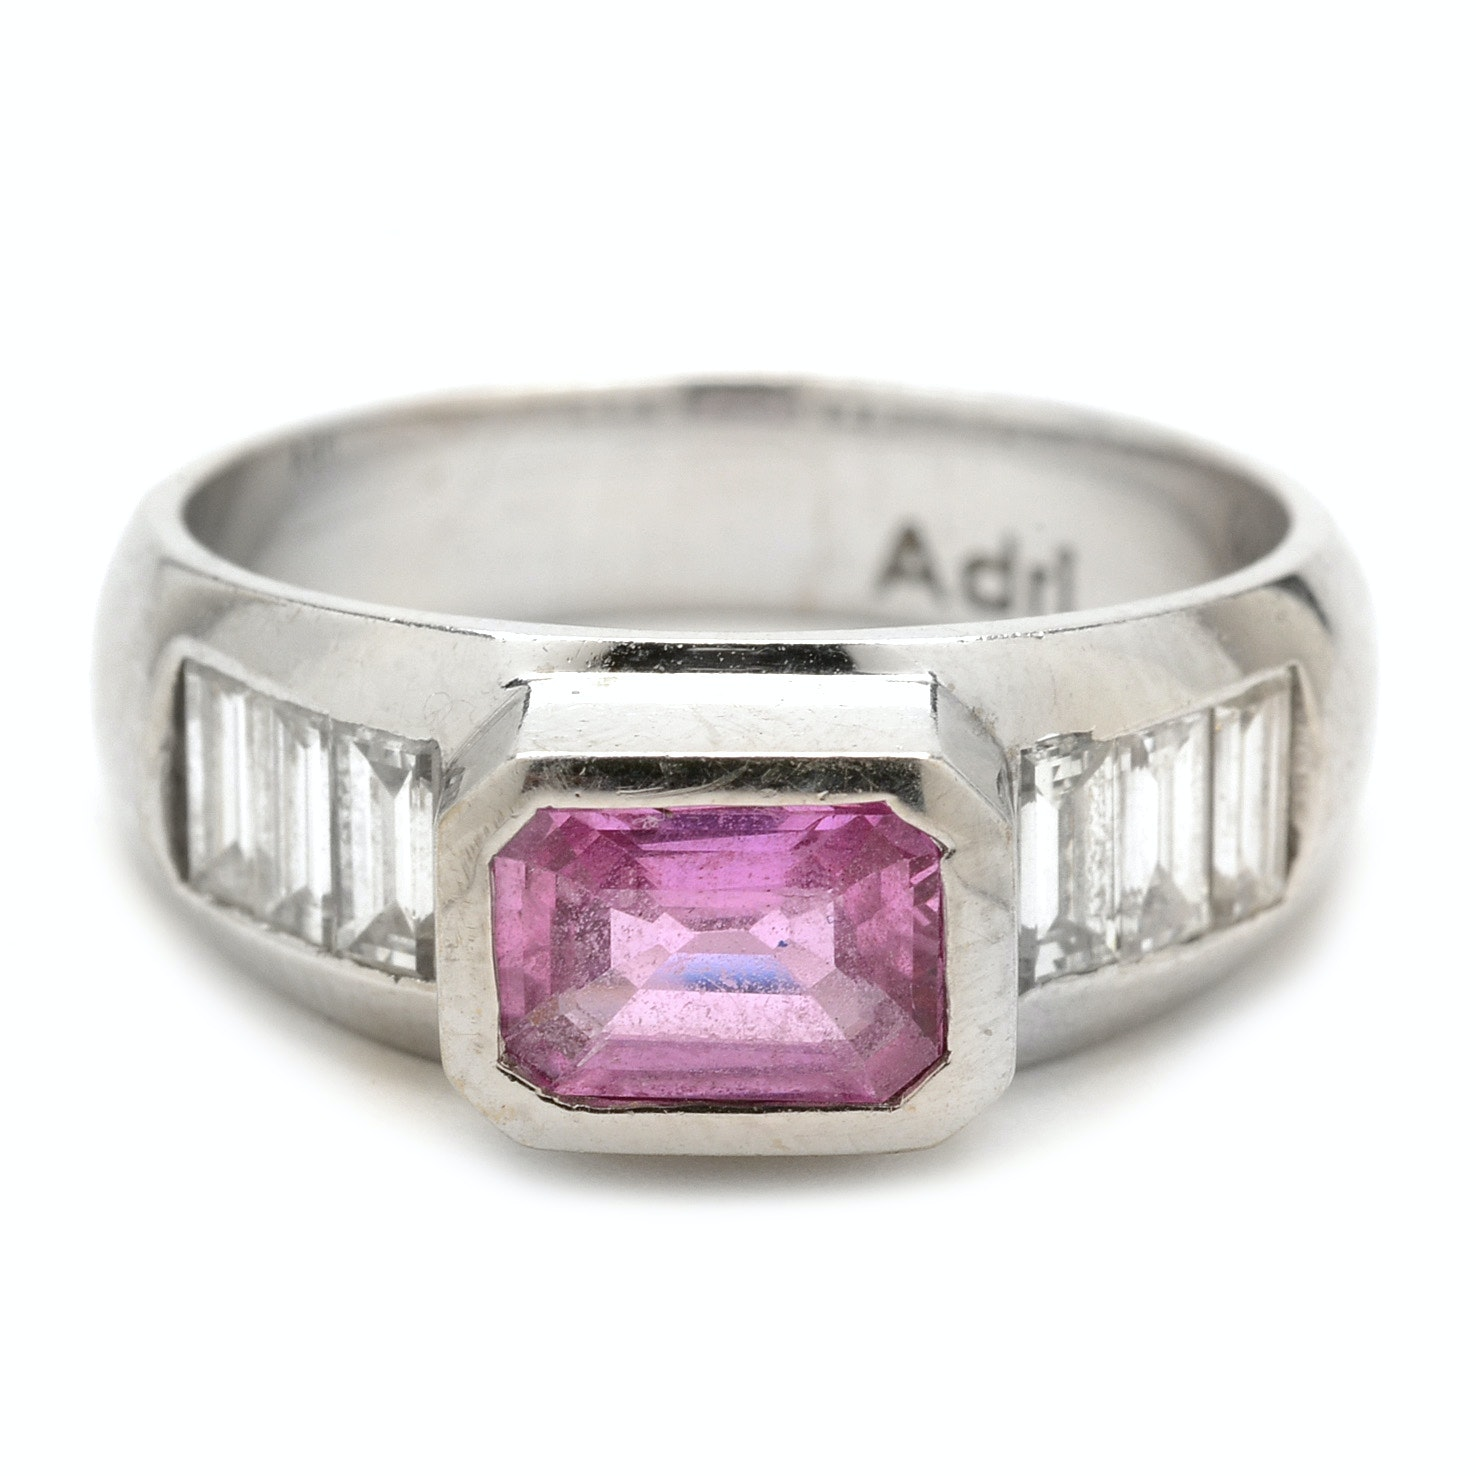 18K White Gold Natural Pink Sapphire Diamond Modernist Ring